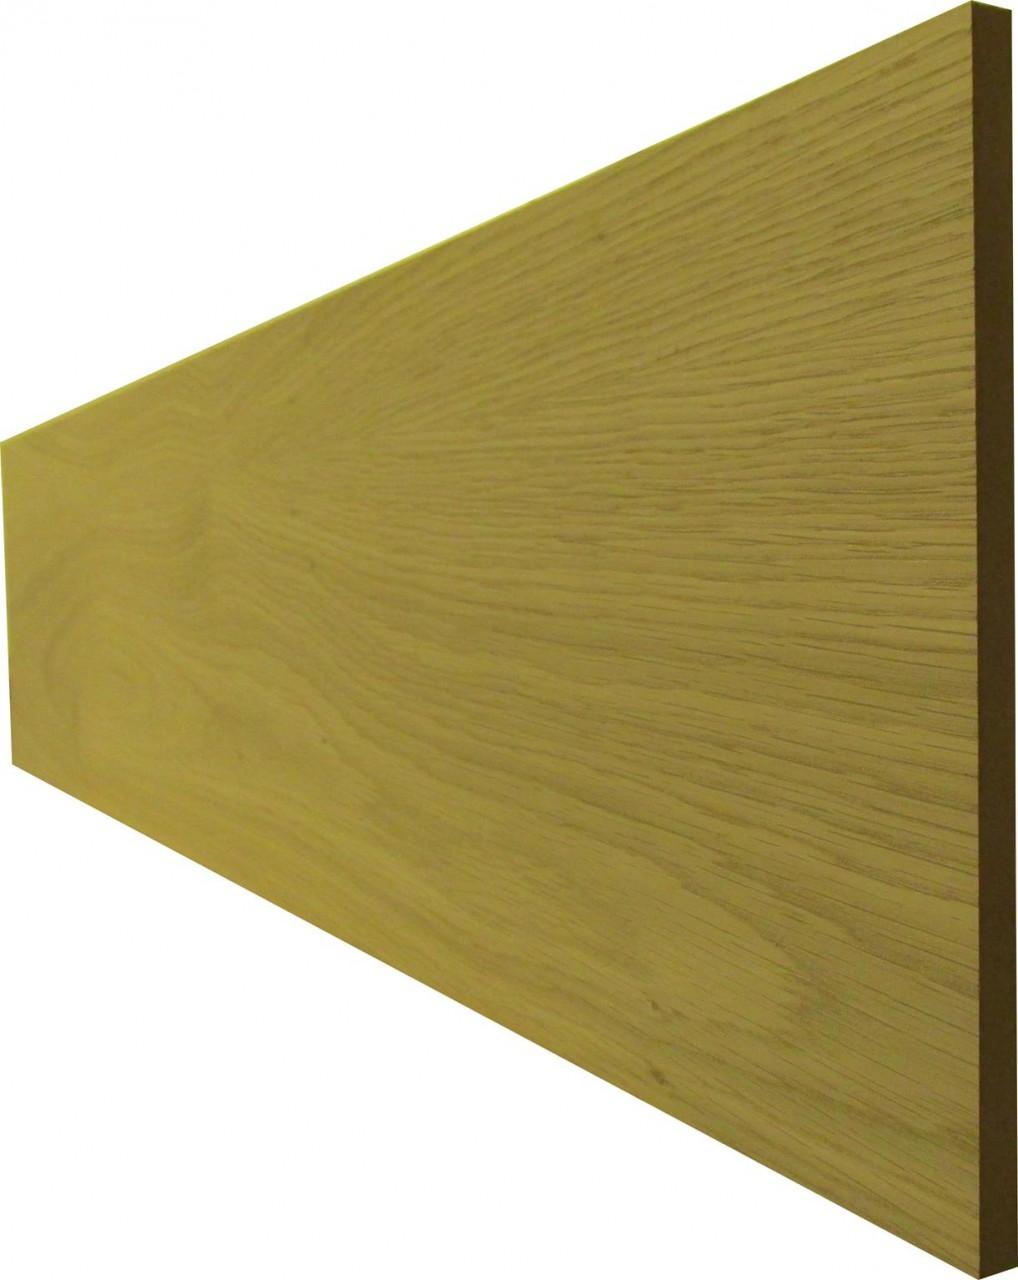 Stair calculator winders -  Basics Oak Stair Cladding Winder Sets Image